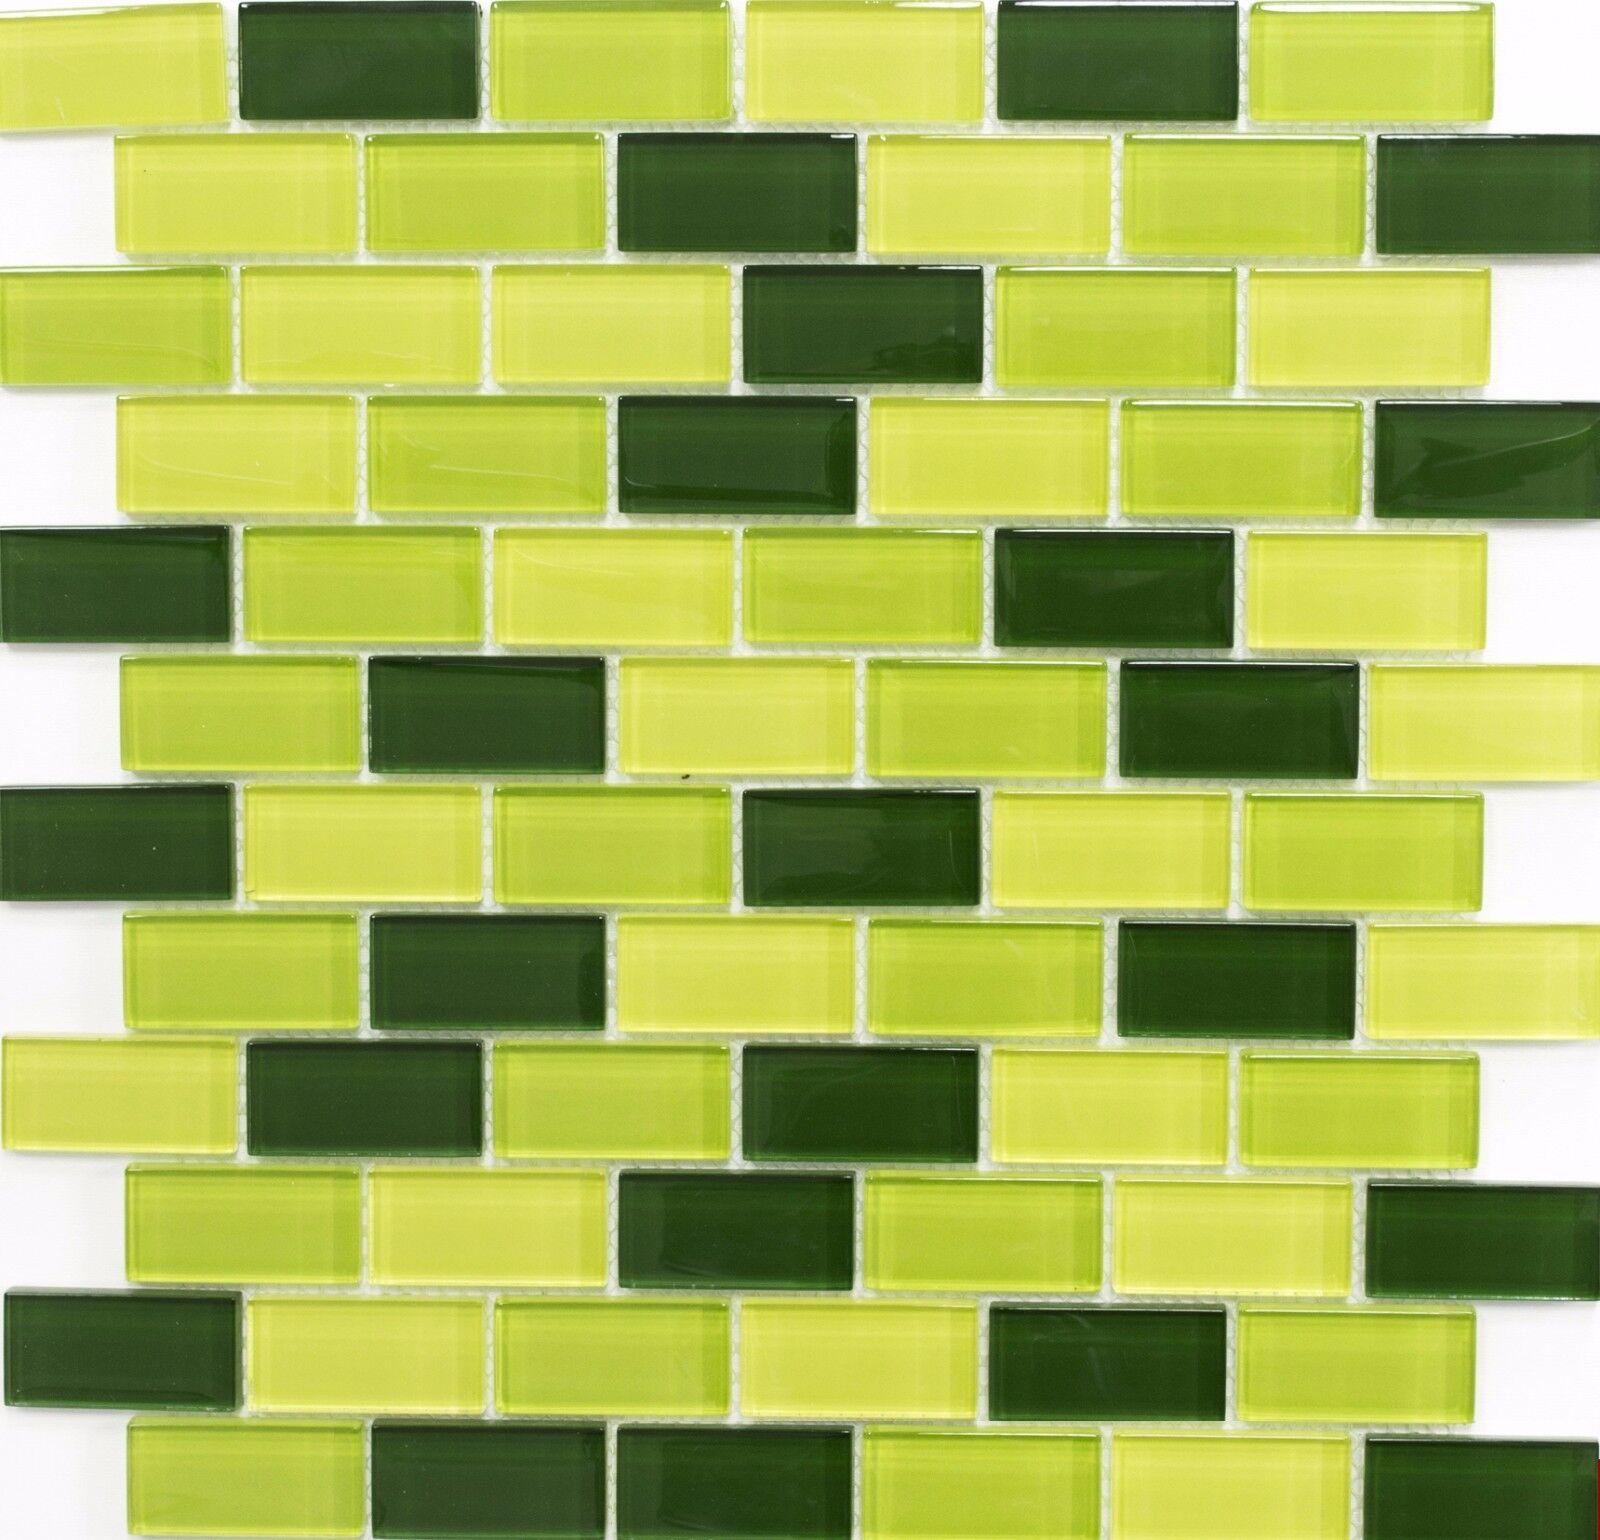 Glasmosaik Verbund mix hellgrün/grün/dunkelgrün Küche Art:76-0506 | 10 Matten